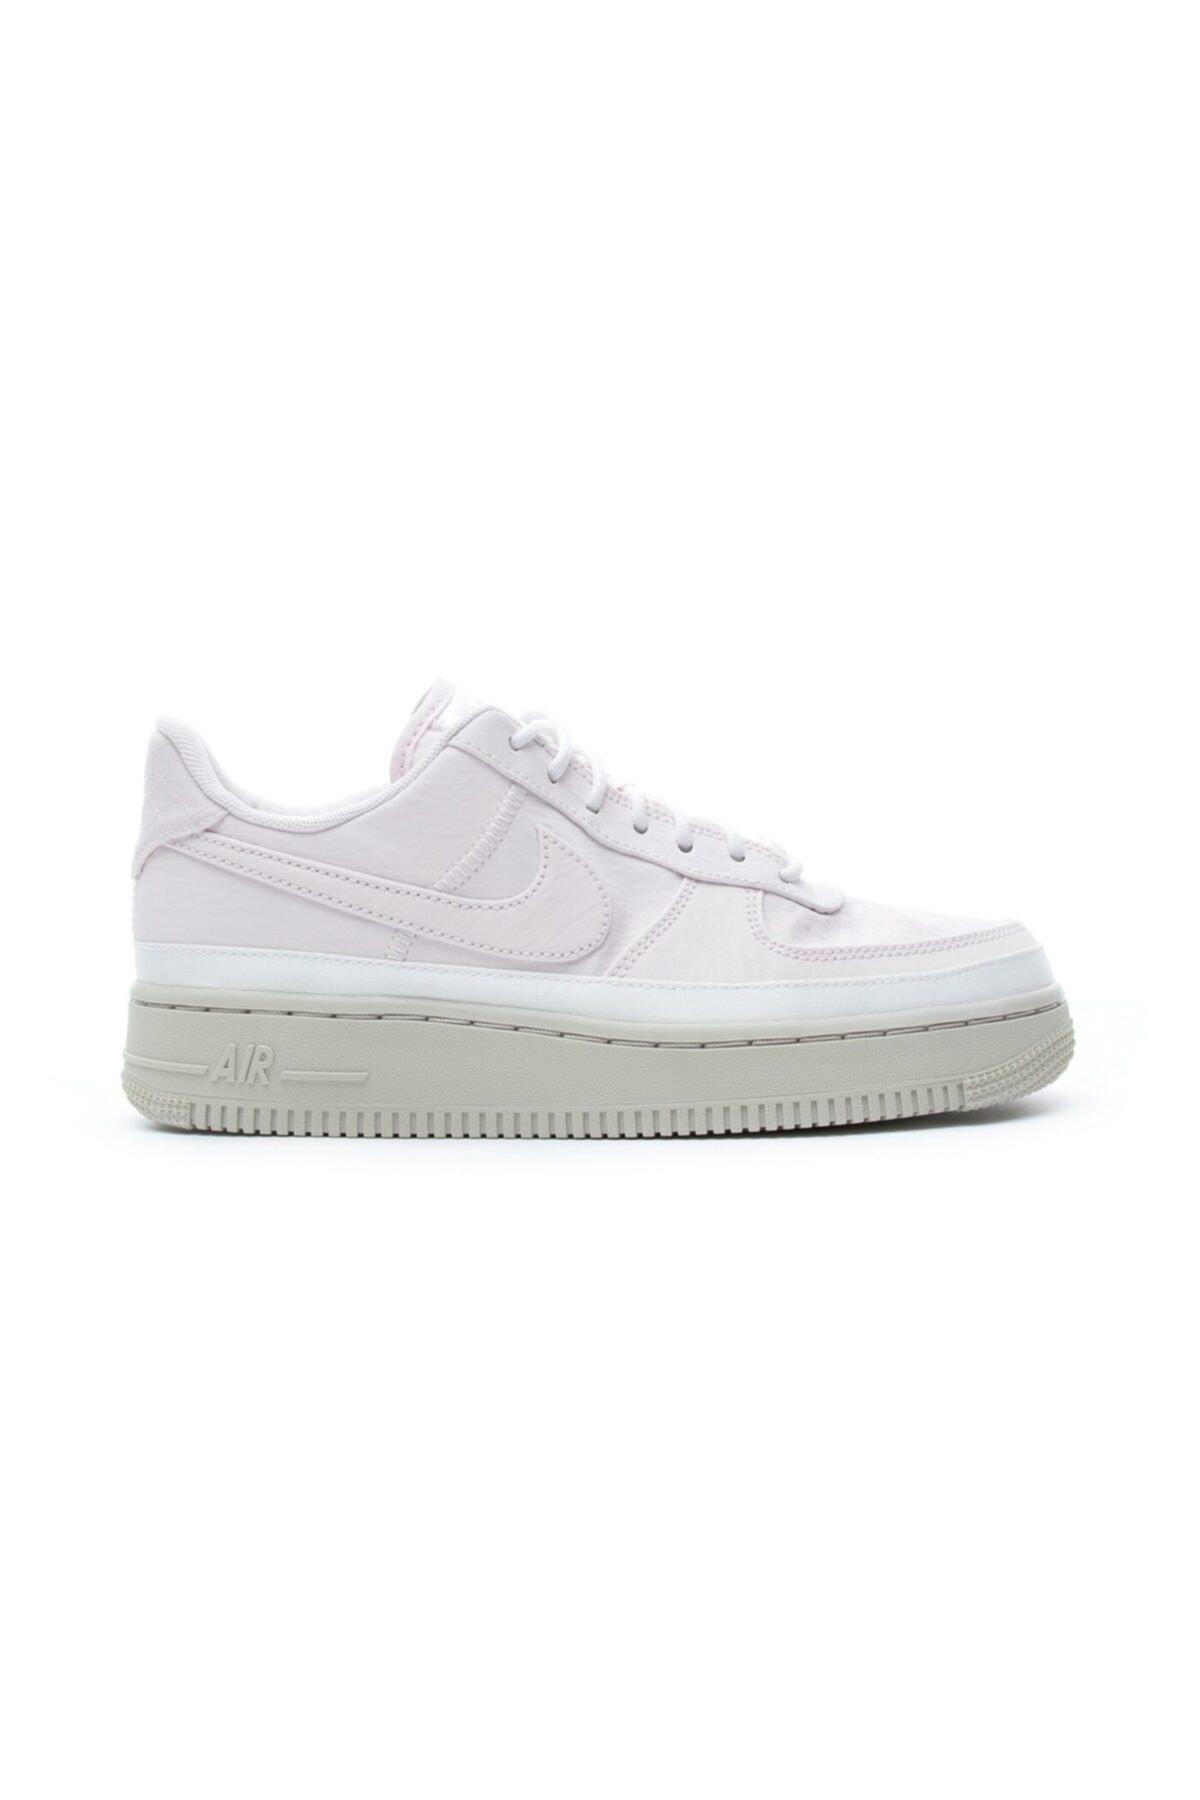 Nike Air Force 1 '07 Se / Aa0287-604 Spor Ayakkabı 1